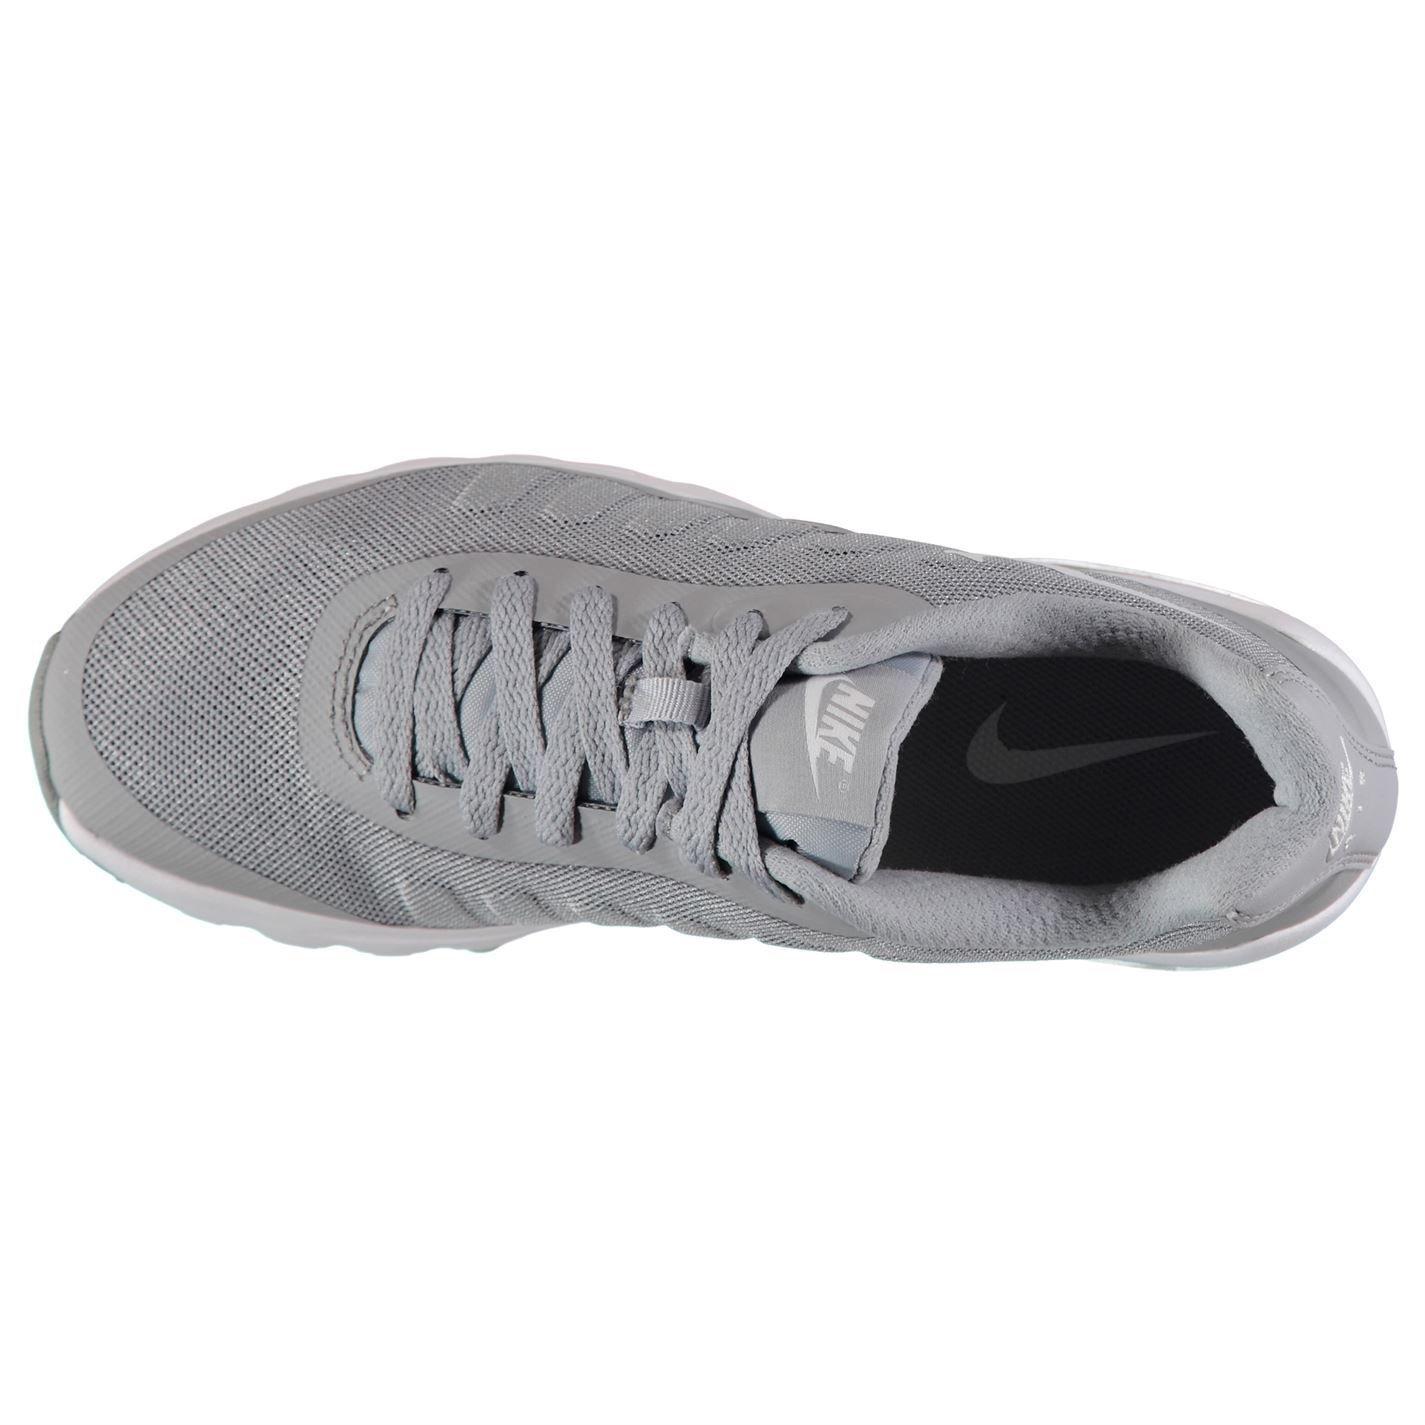 Formateurs Chaussures Nike AirMax Invigor Femme GrisBlanc